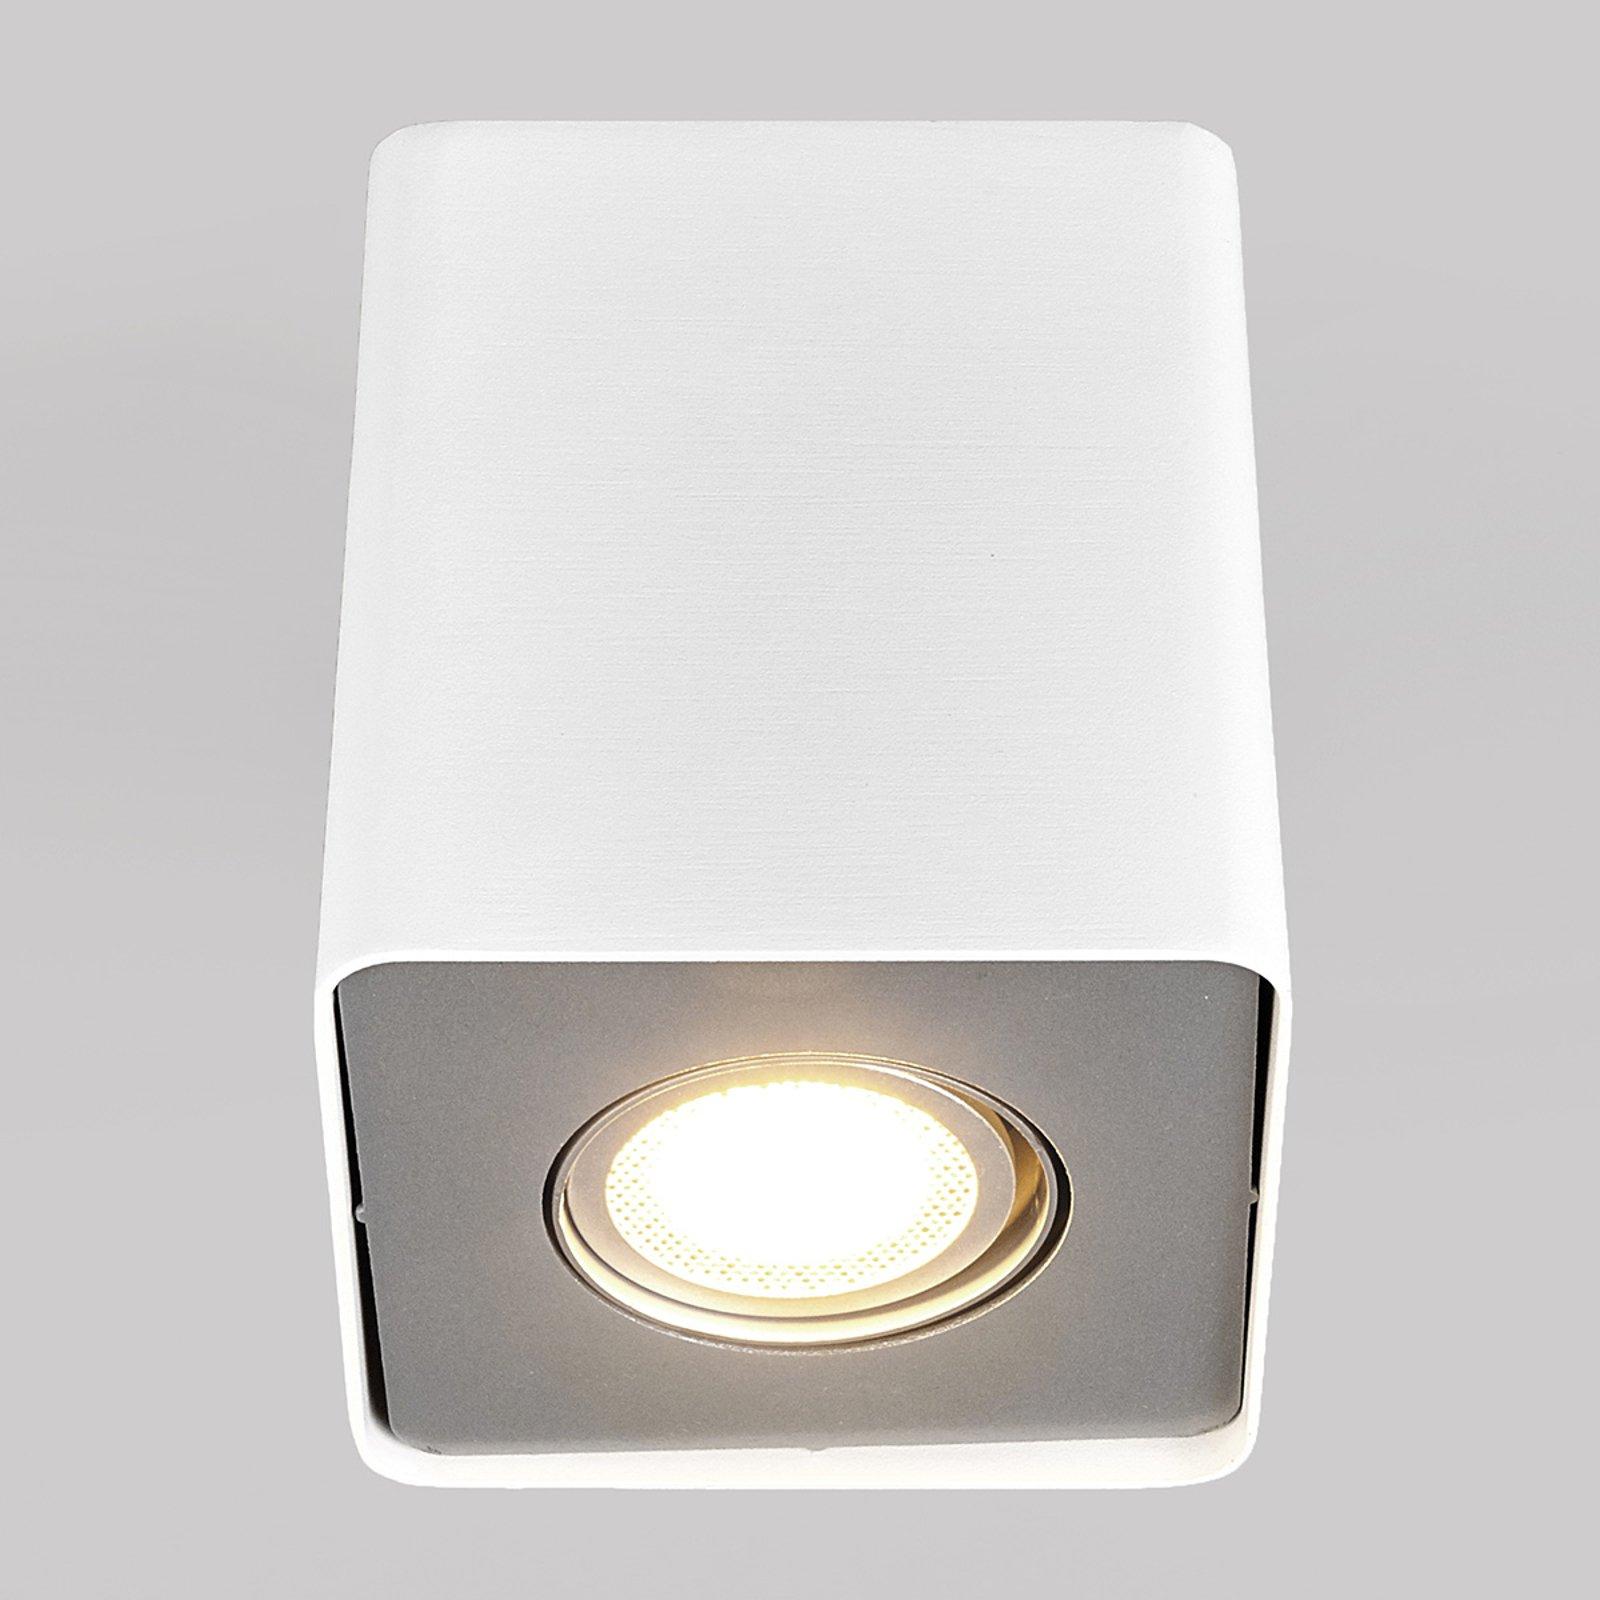 GU10 LED-downlight Giliano, 1lk., kantet, hvit